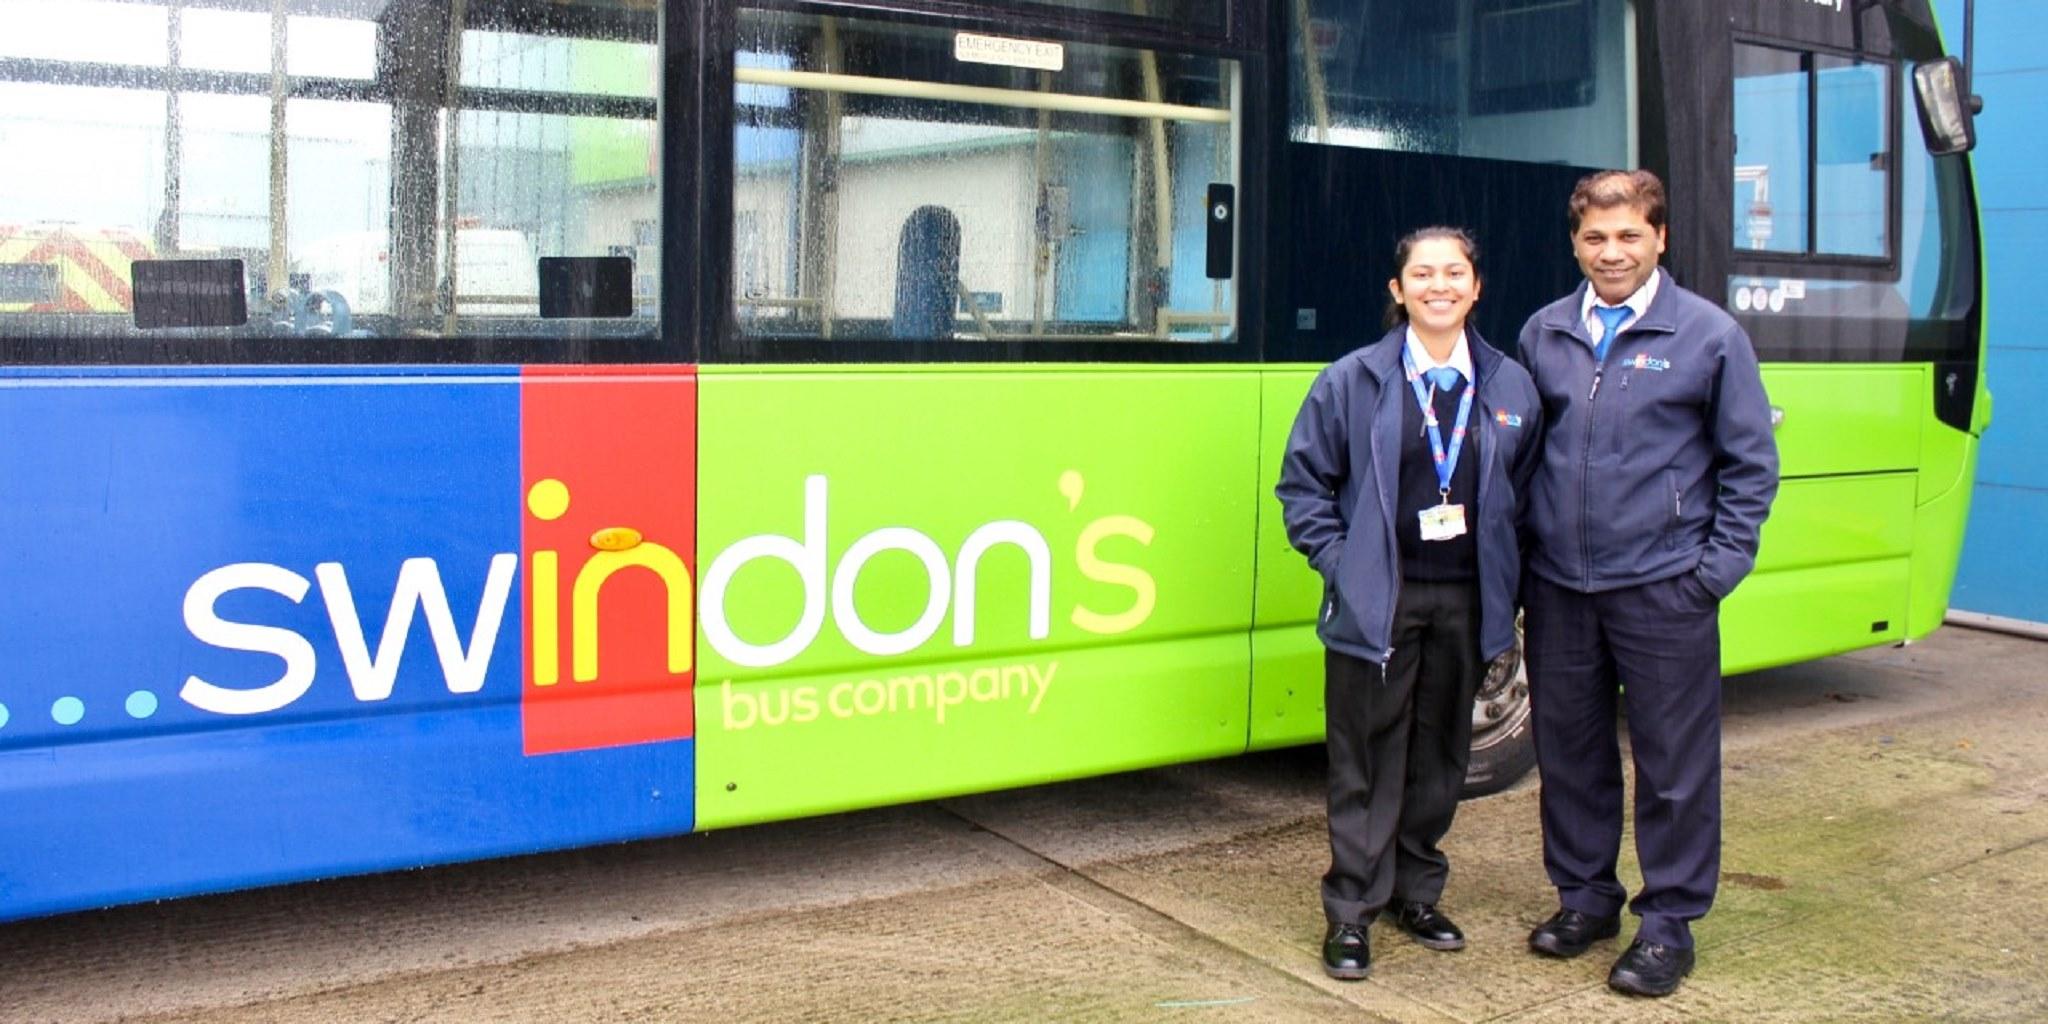 Swindon's Bus Company driver jobs